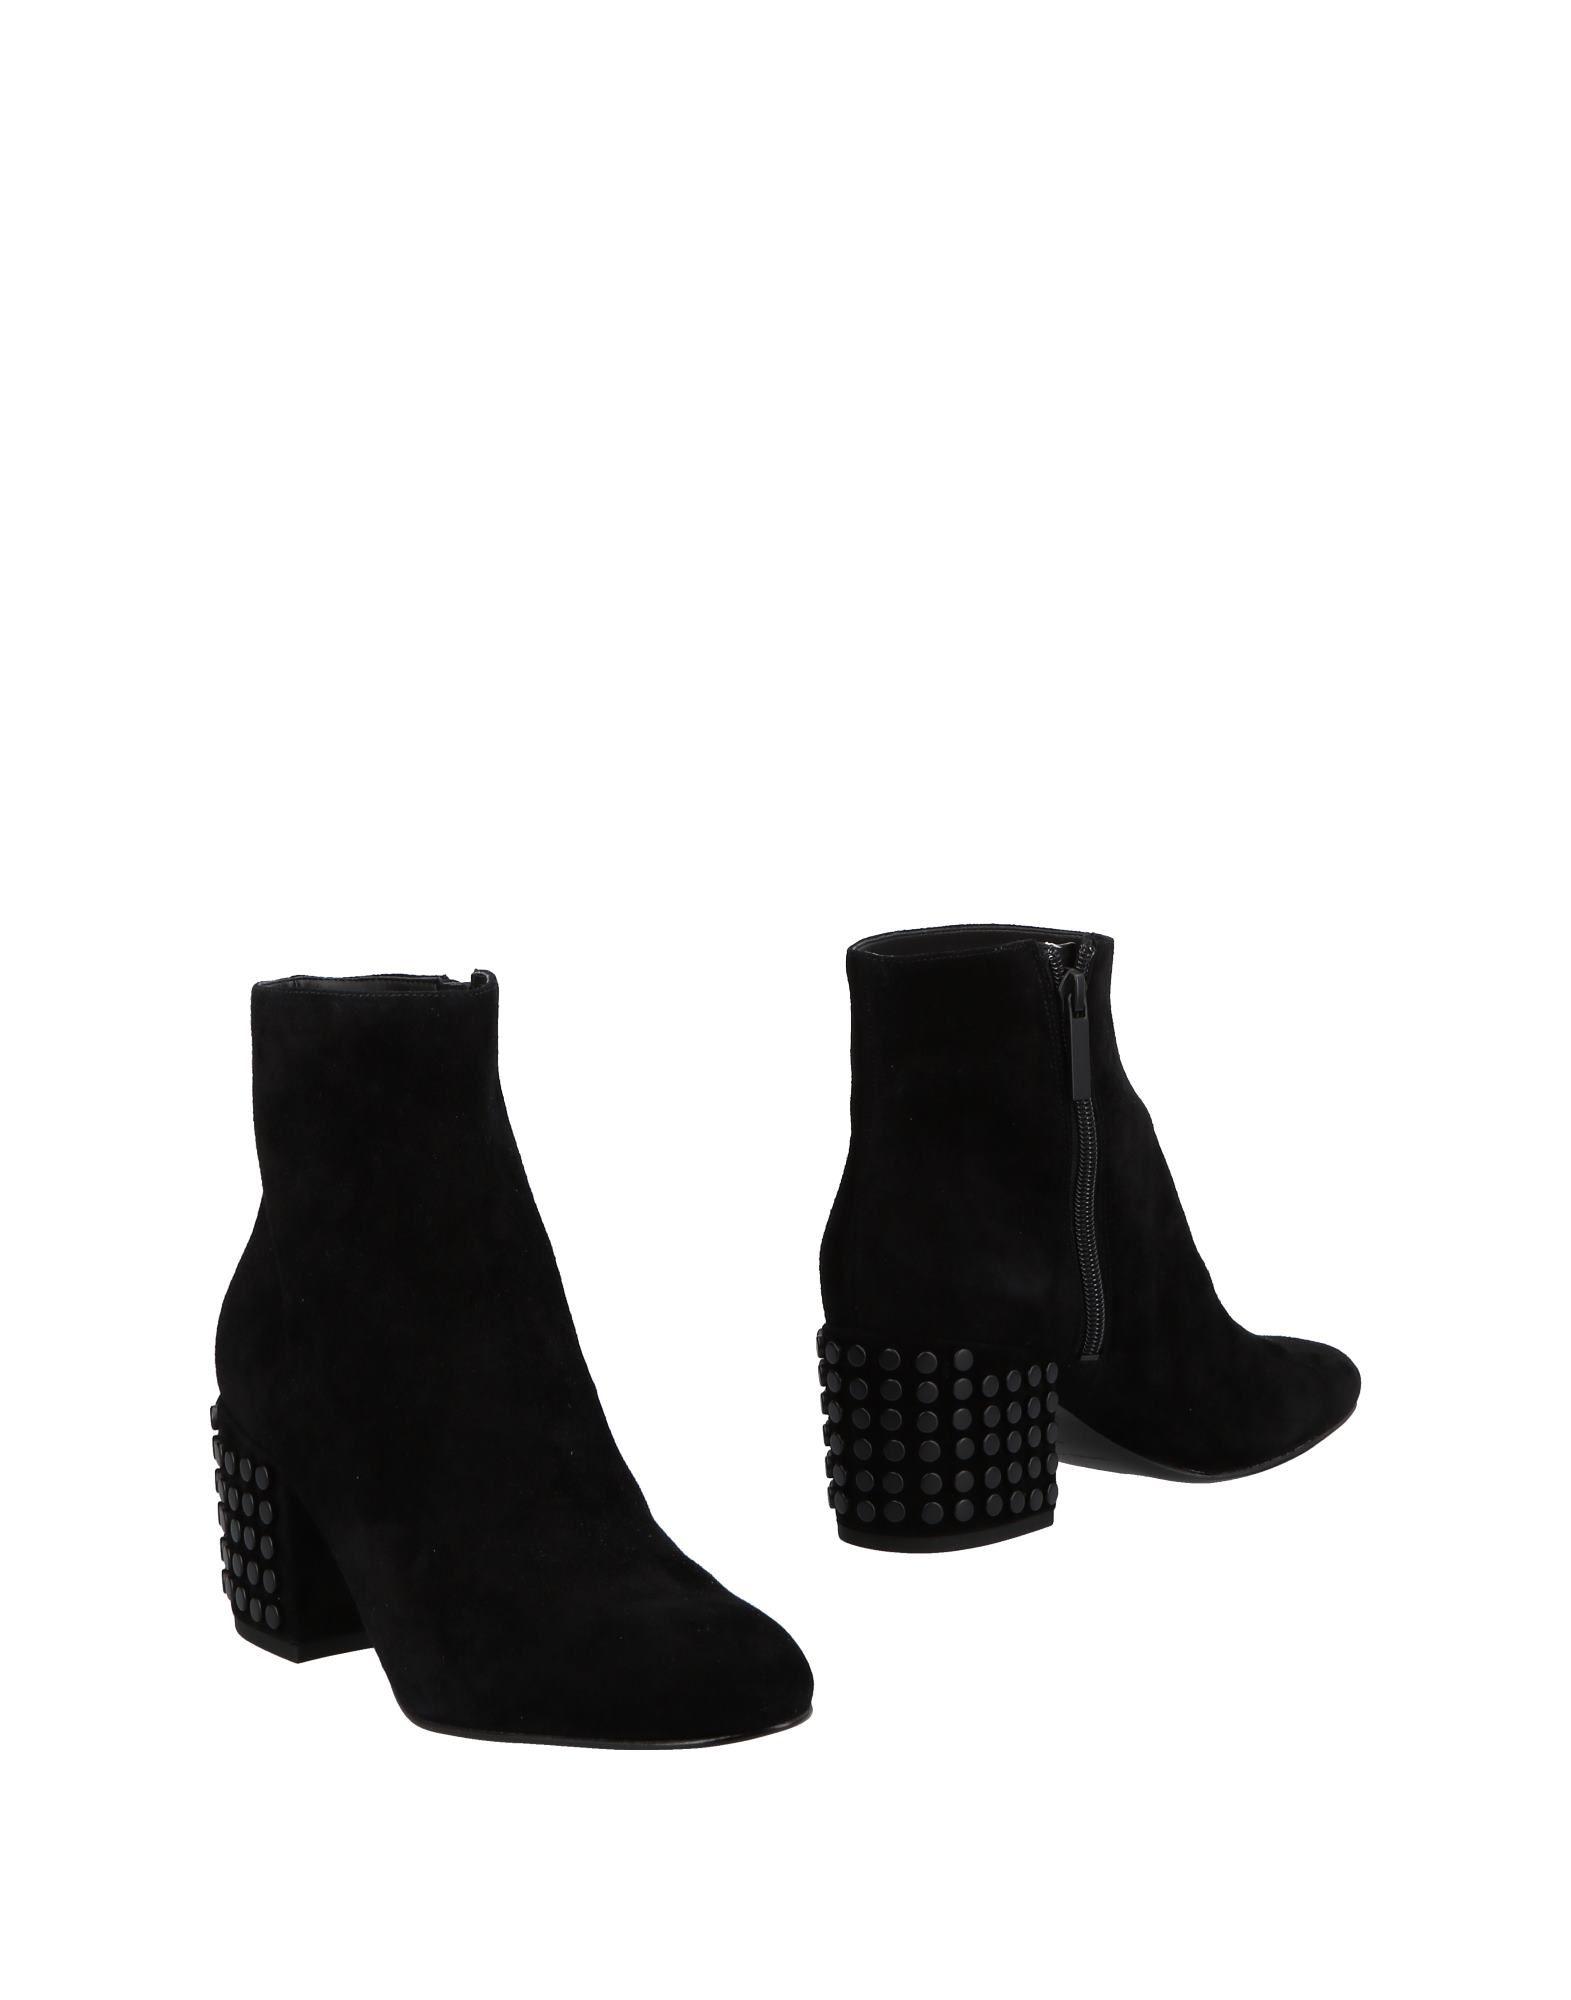 Kendall + Kylie  Stiefelette Damen  Kylie 11492718FB Neue Schuhe b9743e